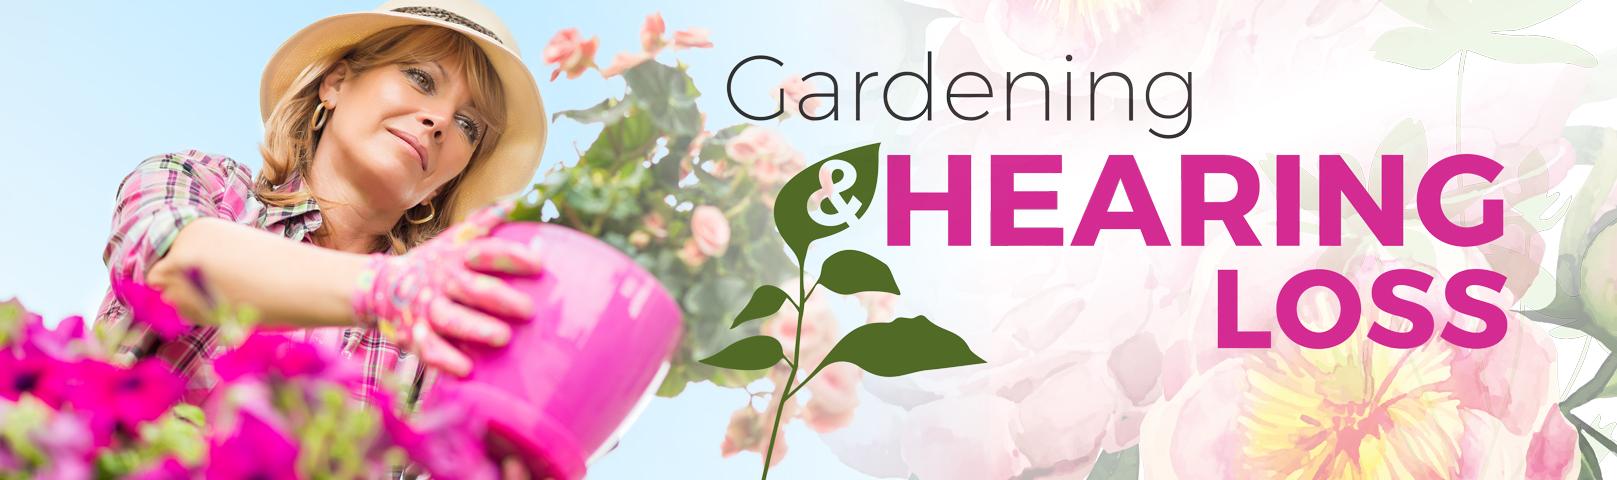 Gardening & Hearing Loss